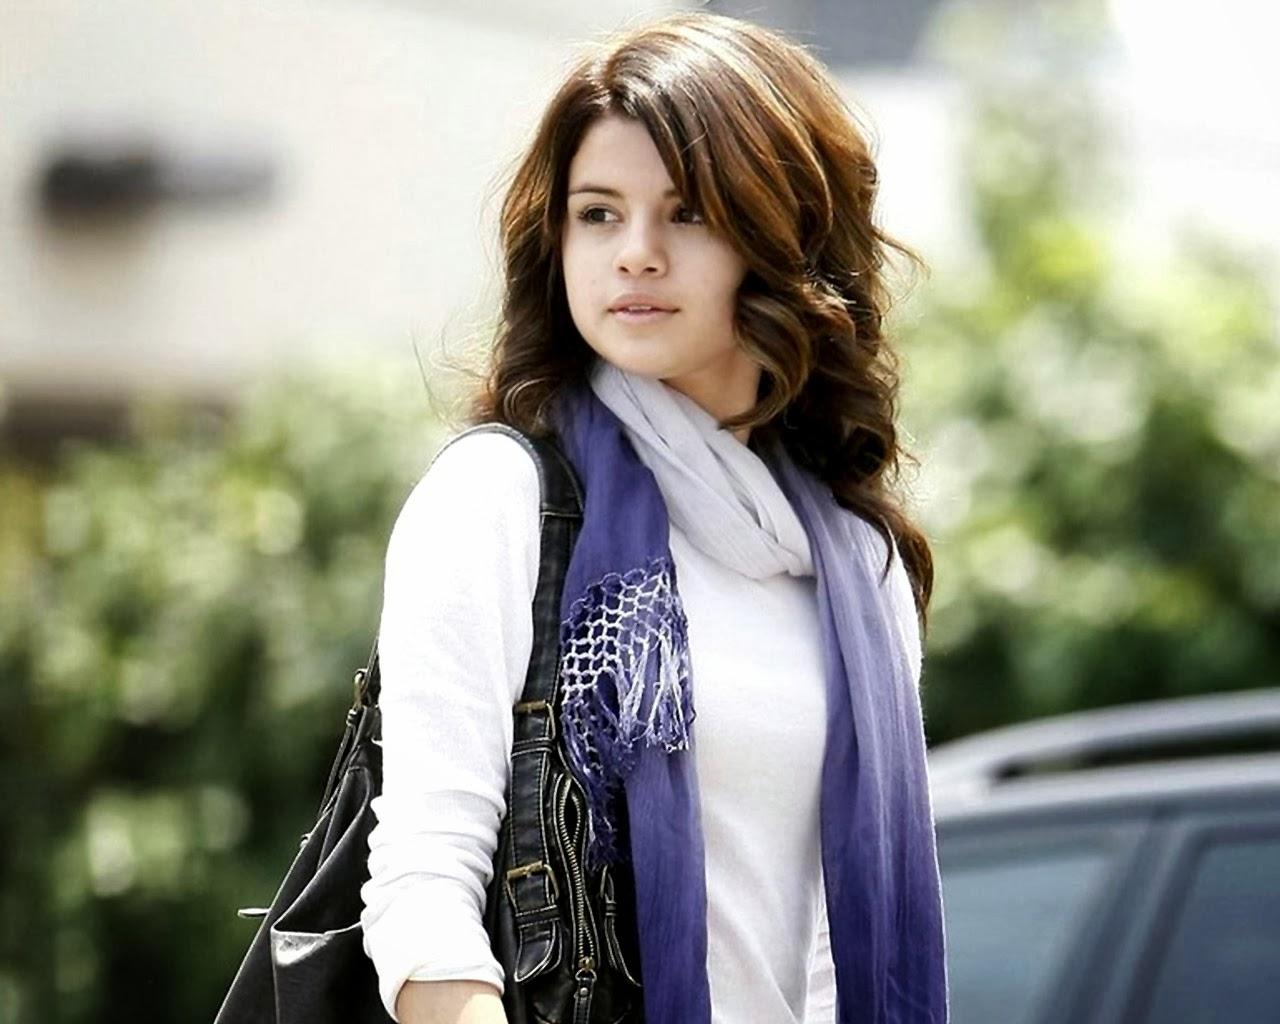 Selena Gomez Hd Wallpapers Download Beautiful Desktop